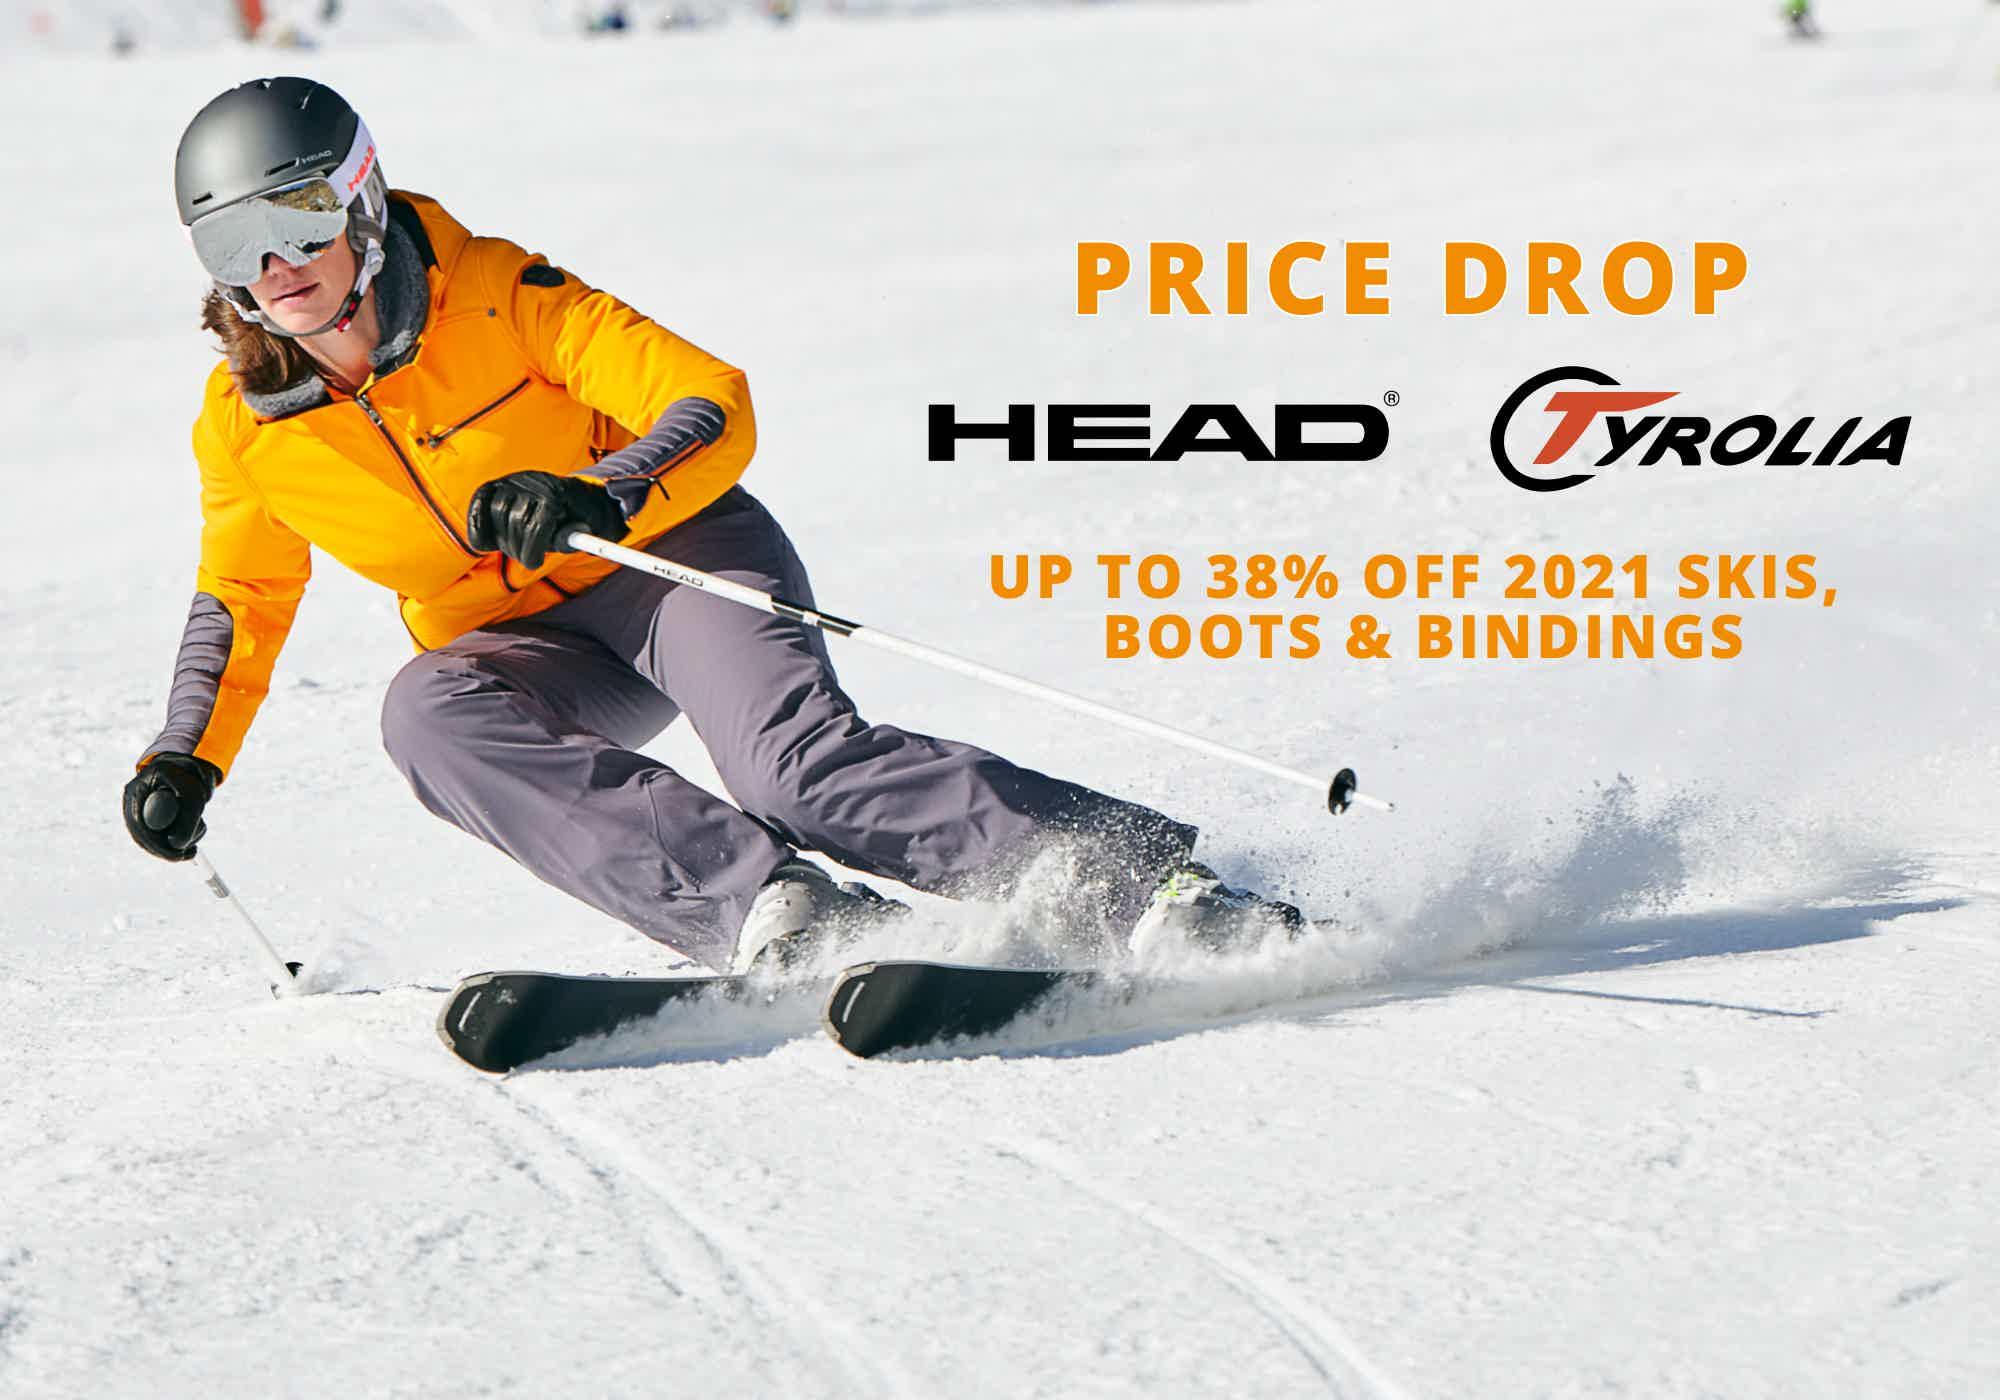 Head Tyrolia Price Drop